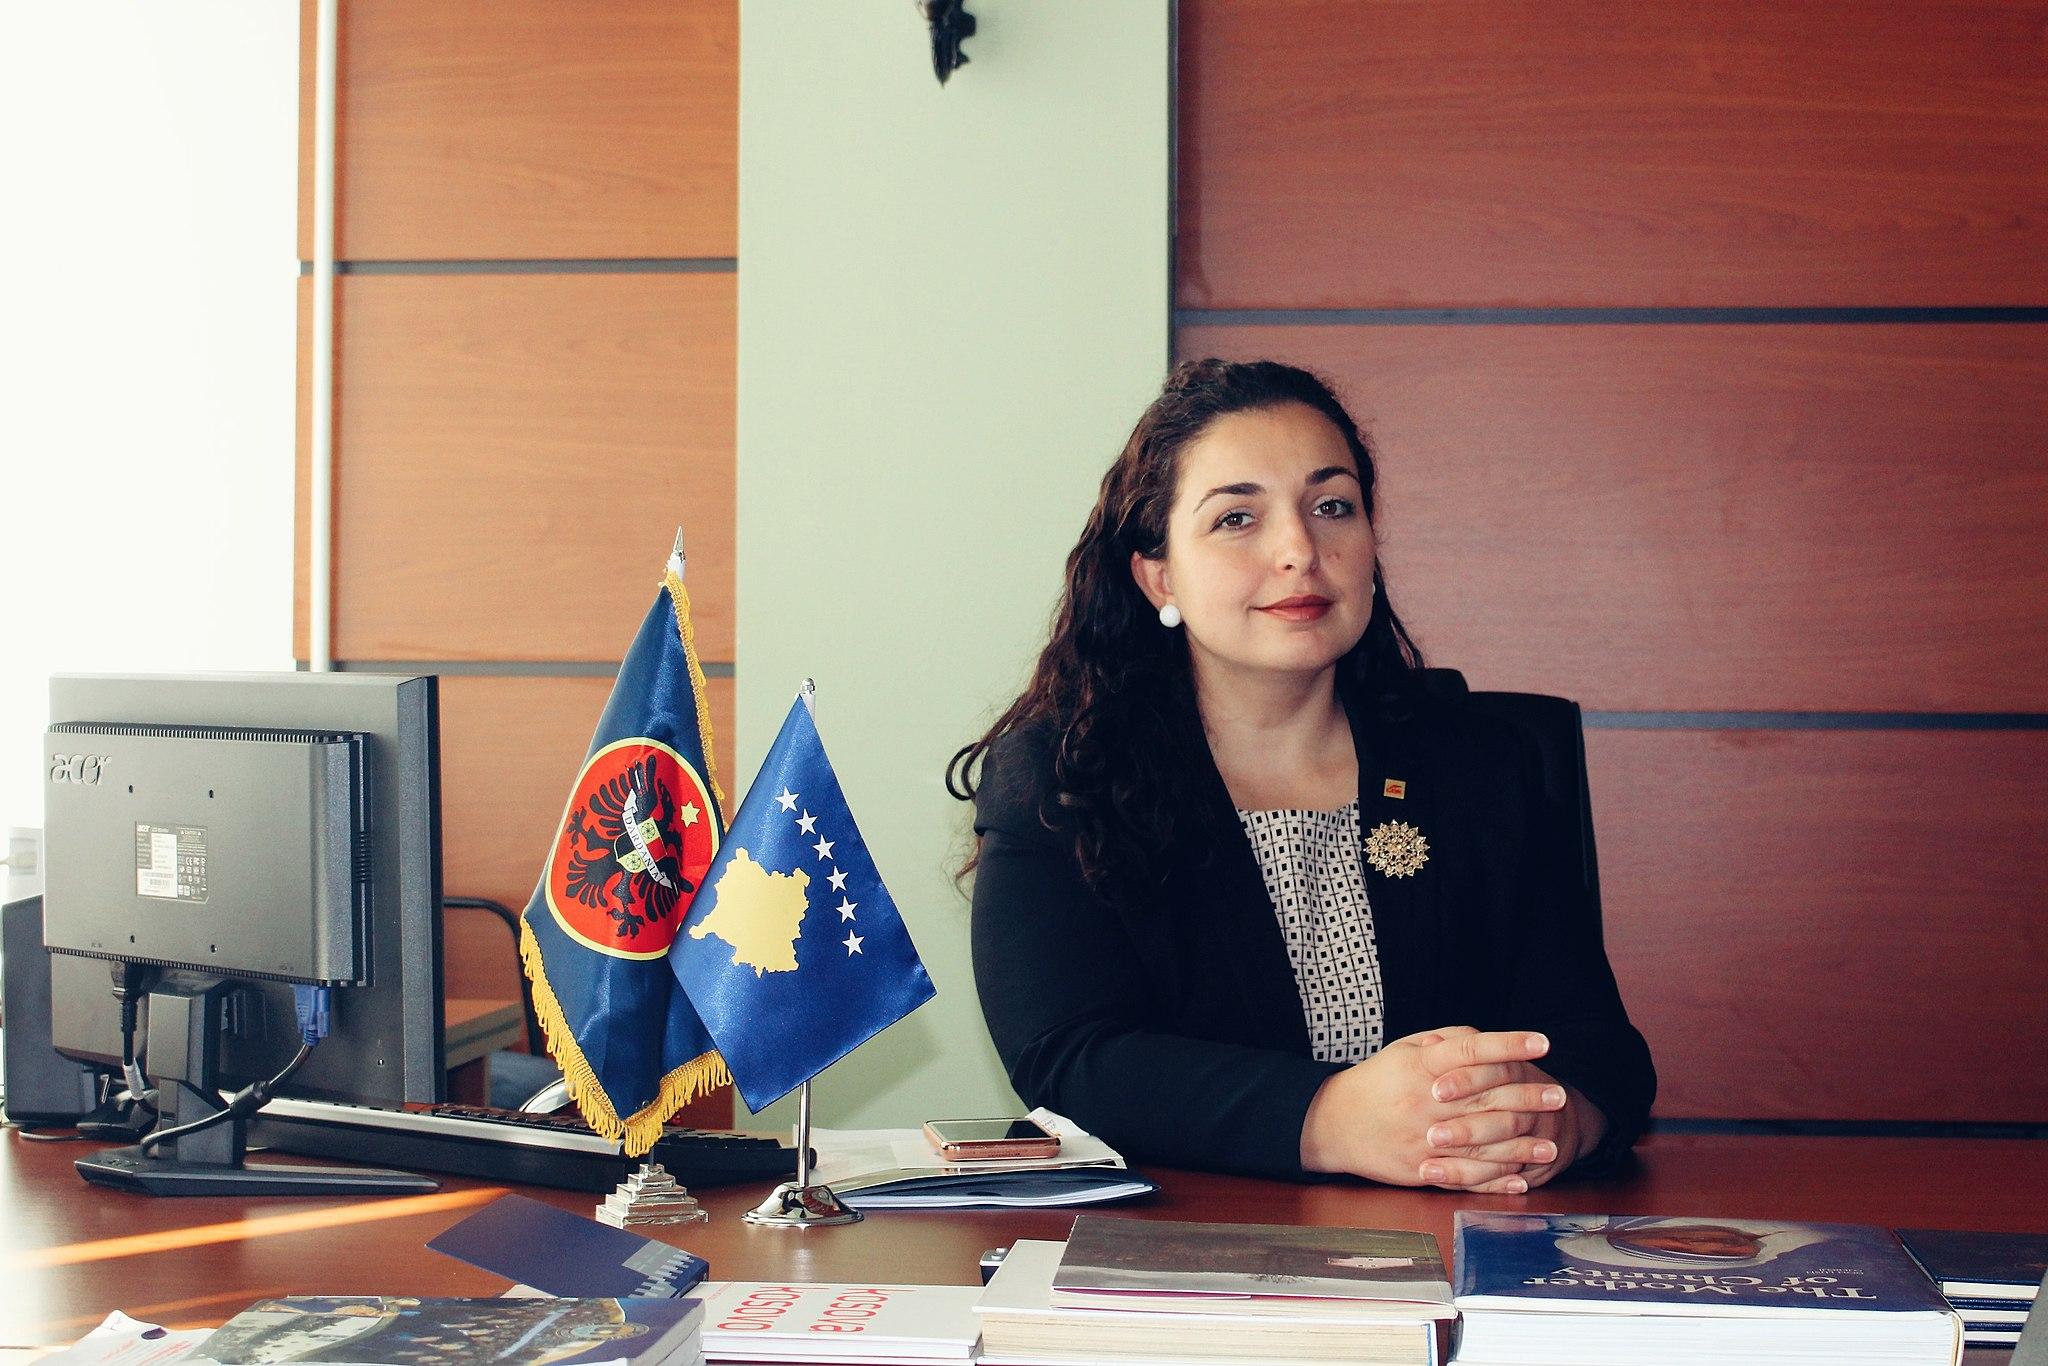 La candidata premier dell'Ldk Vjosa Osmani - Egnesa Vitia [CC BY-SA 4.0 (https://creativecommons.org/licenses/by-sa/4.0)]